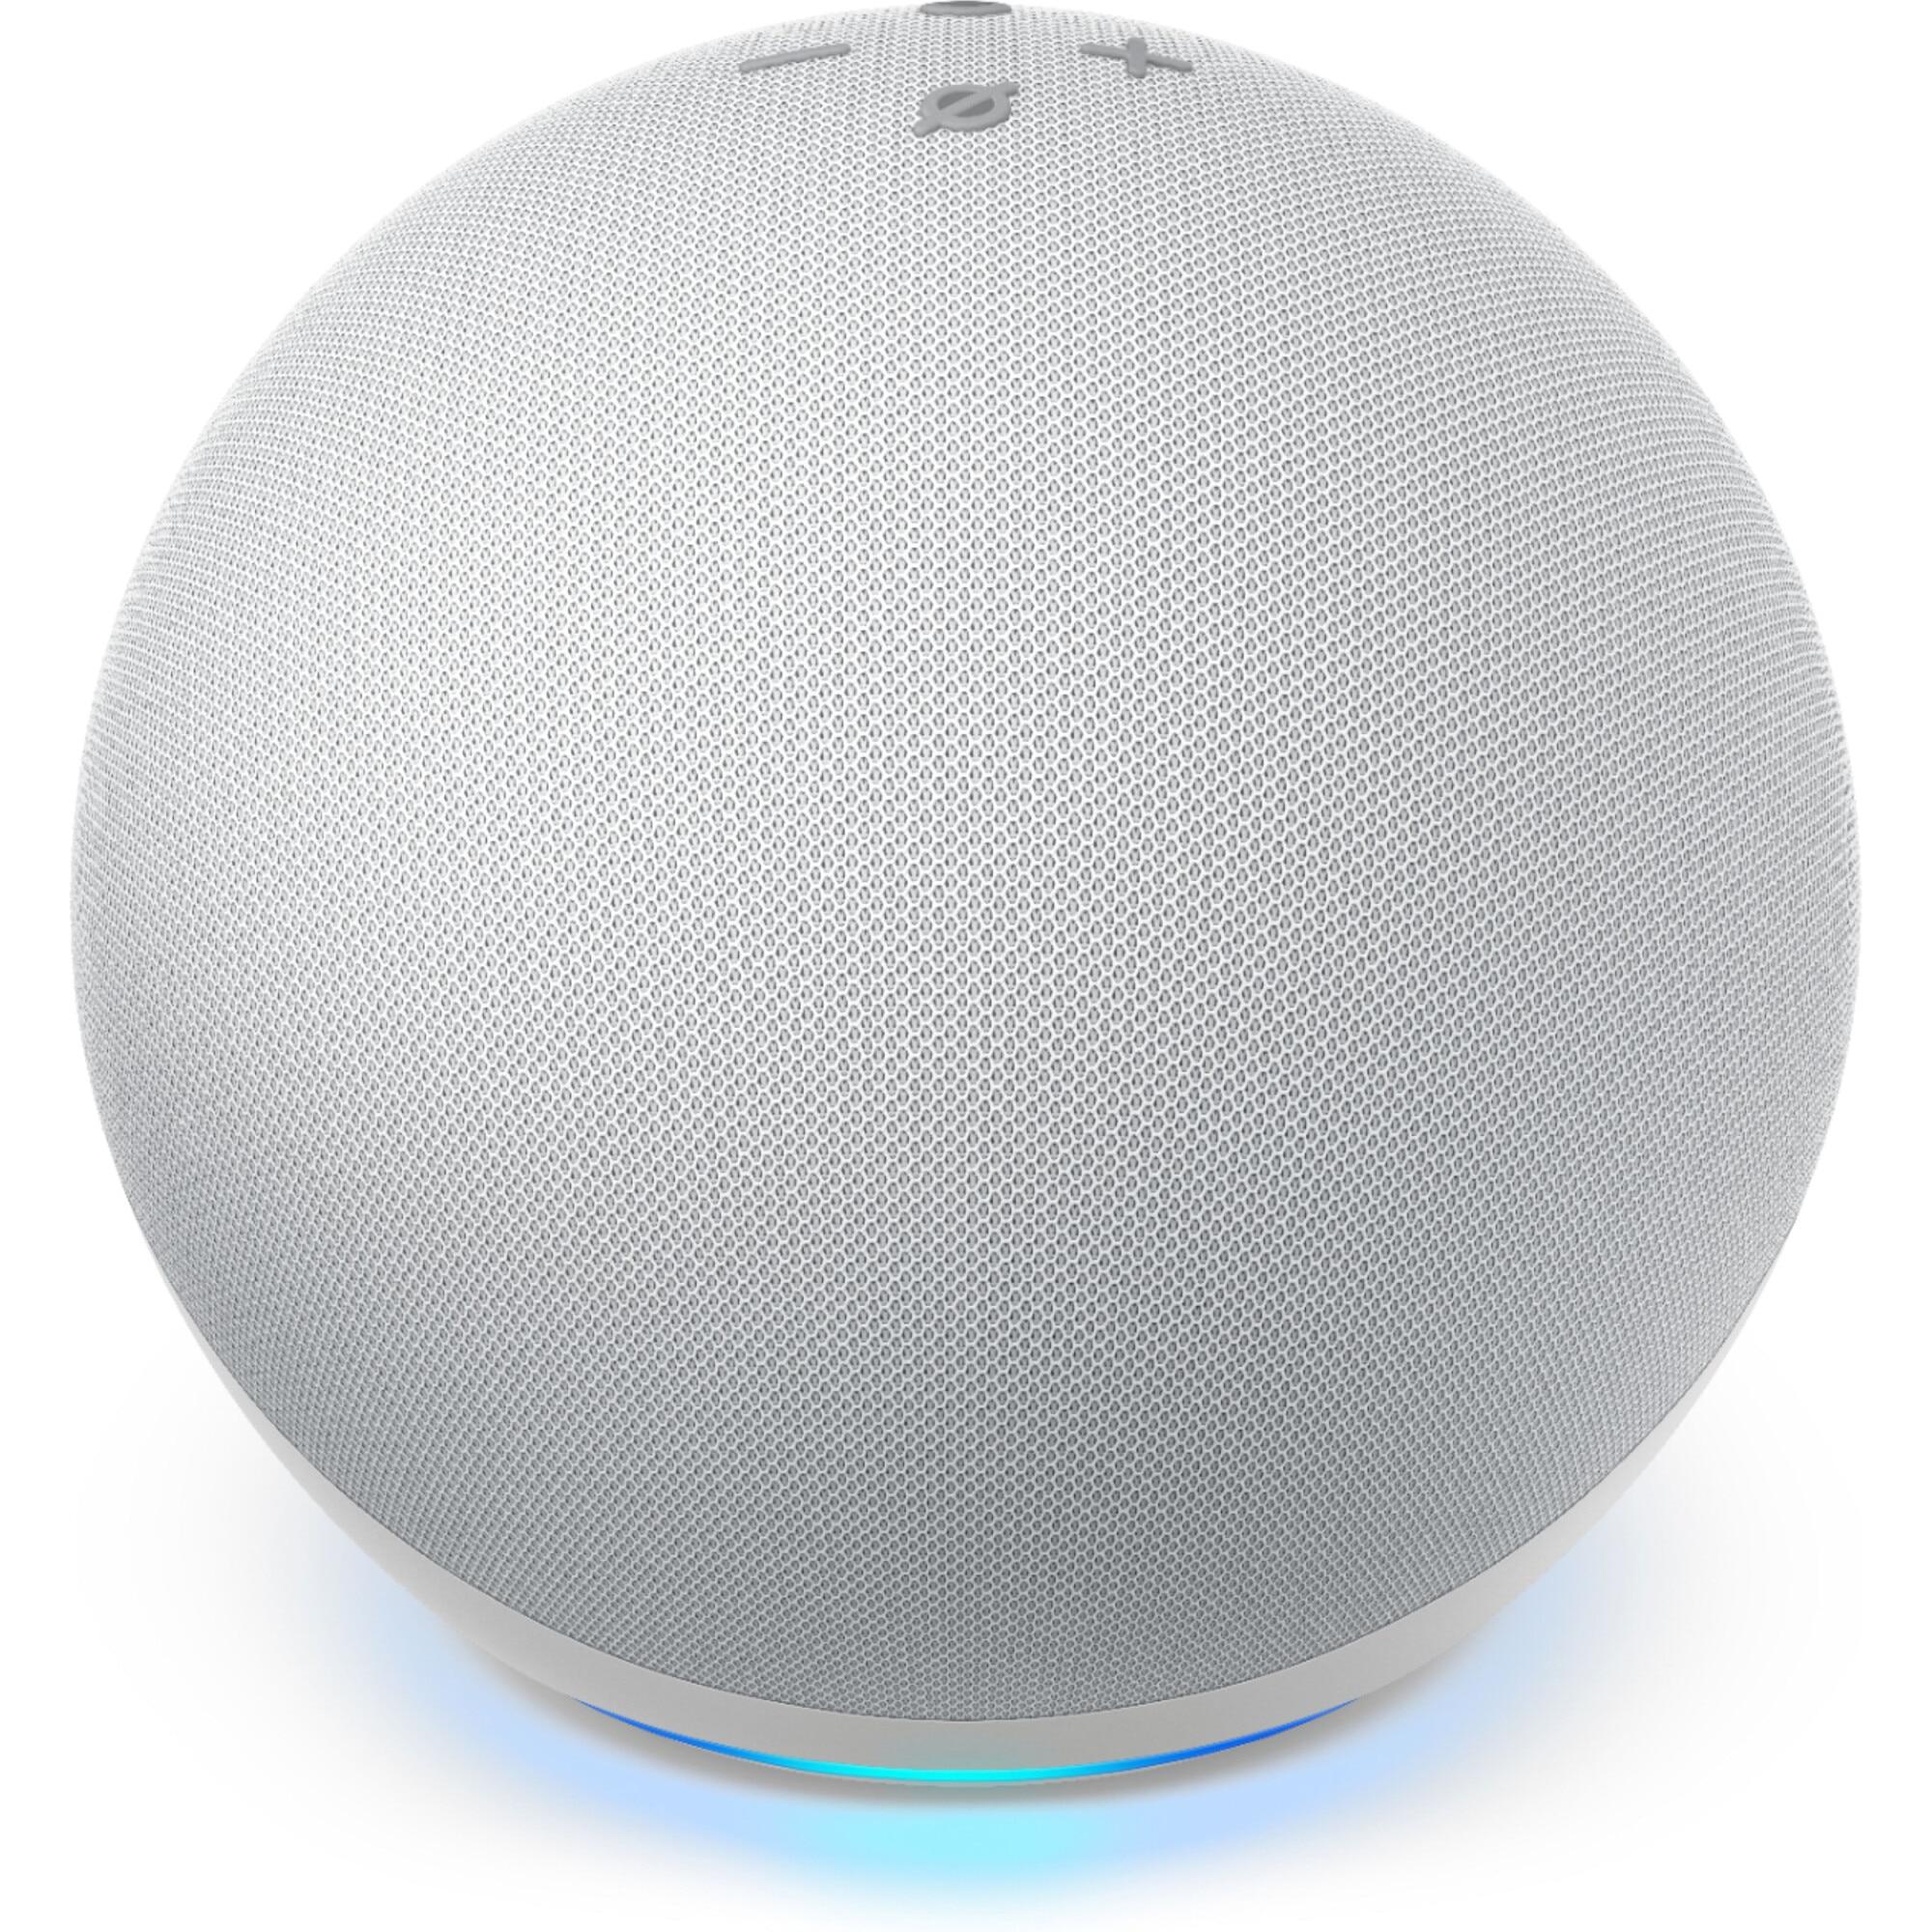 Fotografie Boxa inteligenta Amazon Echo 4, Control Voce Alexa, Wi-Fi, Bluetooth, Dolby, Alb